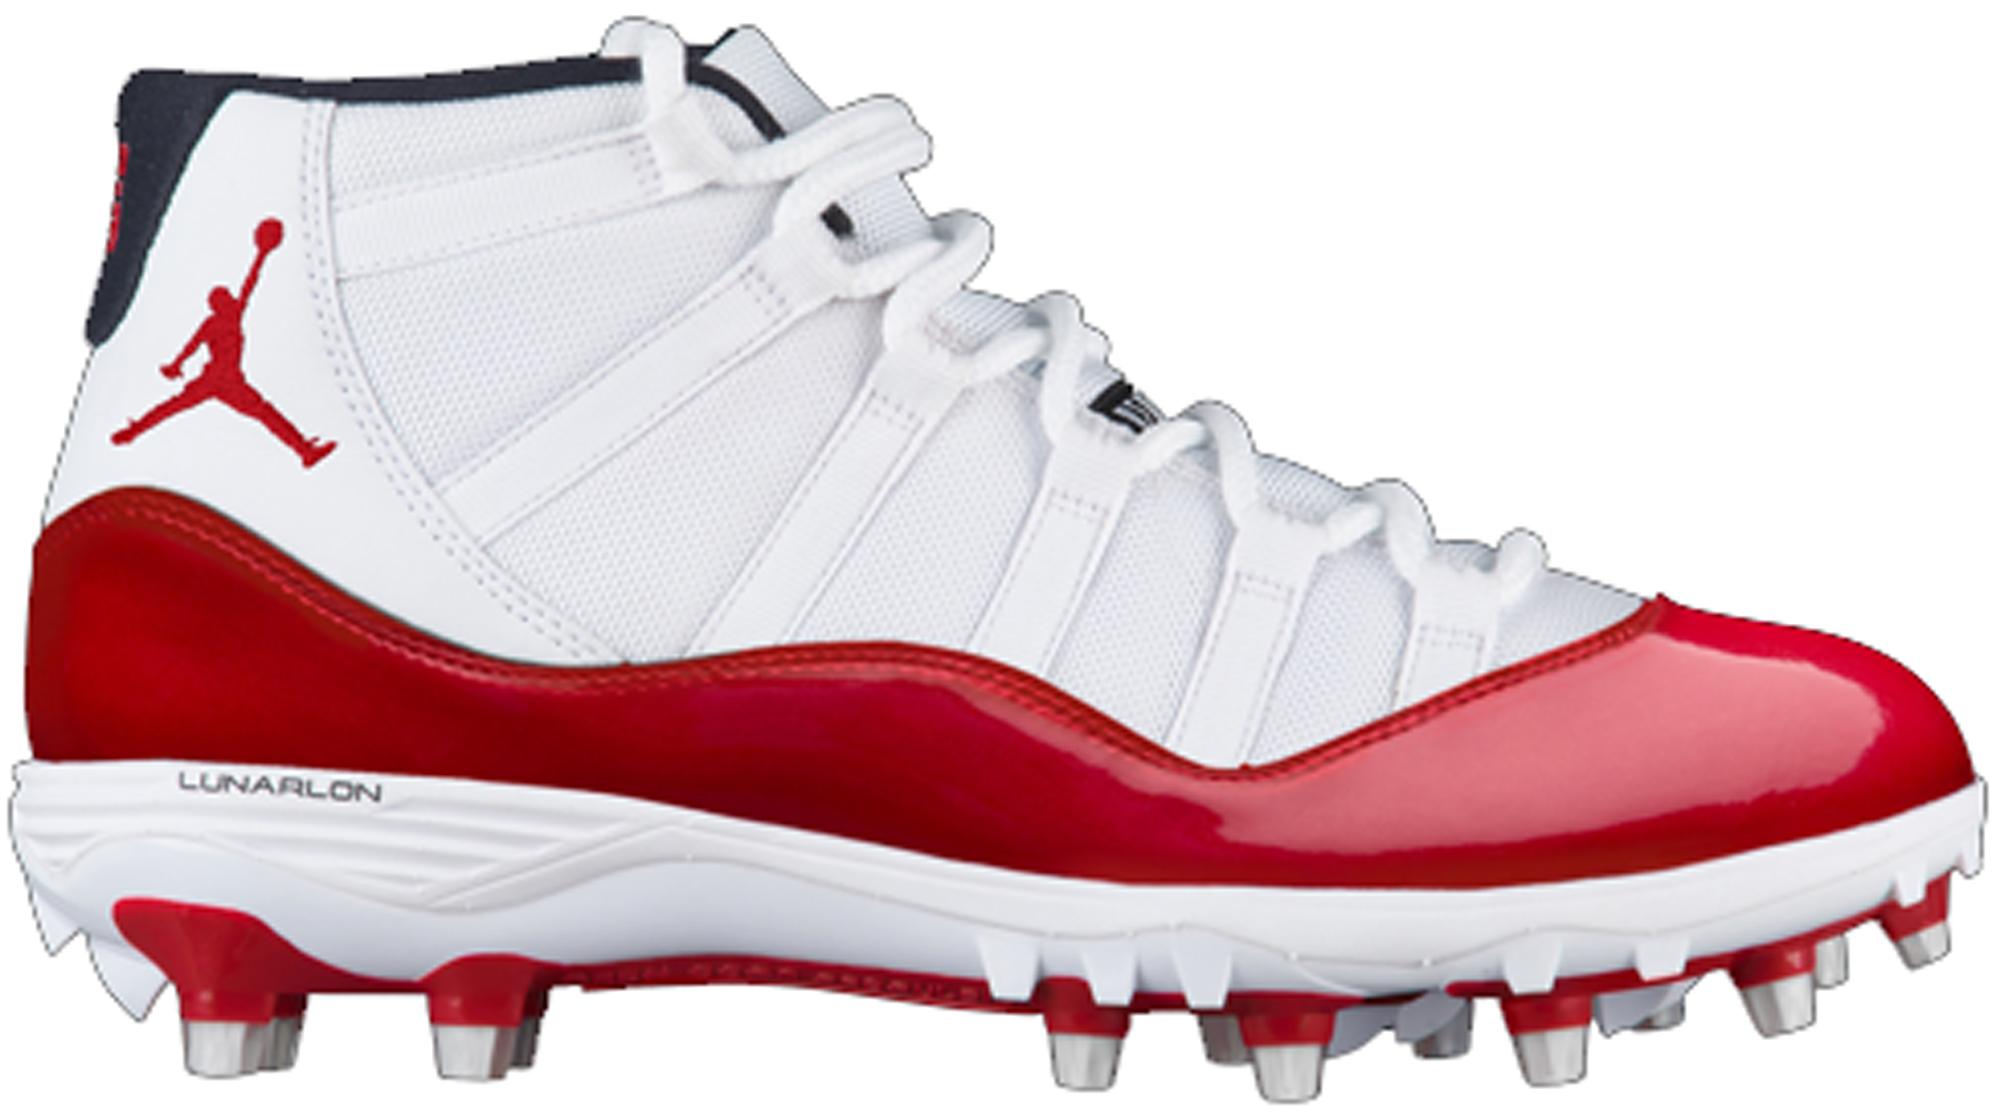 Jordan 11 Retro Cleat White Red